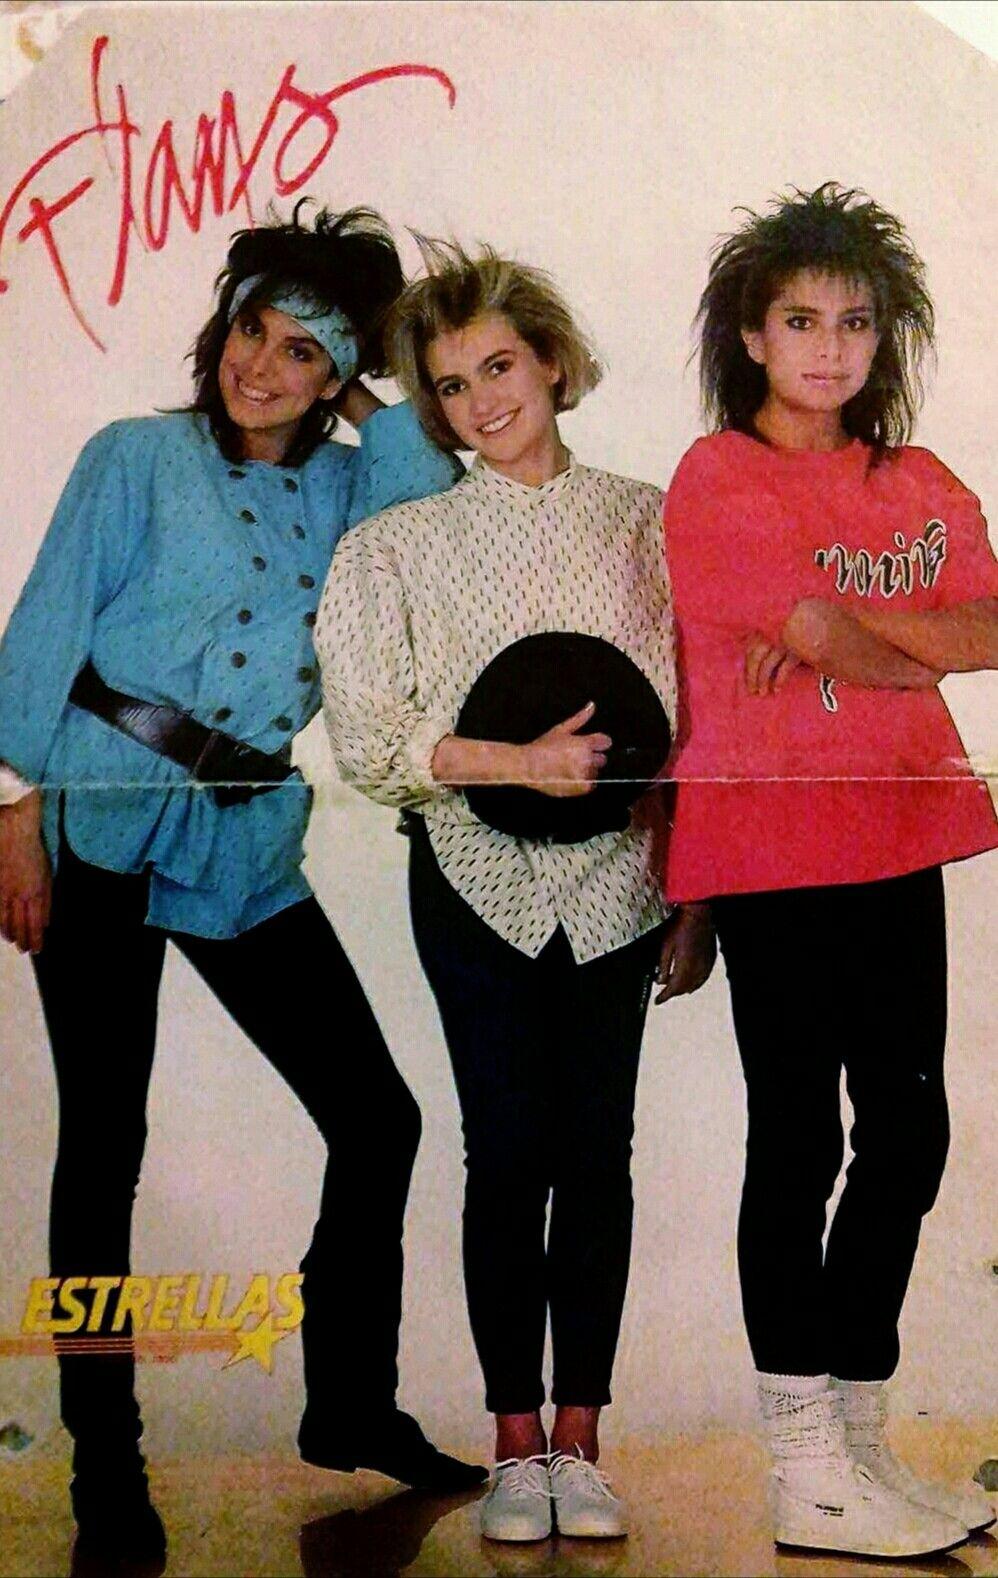 Pin en 80's fashion and makeup